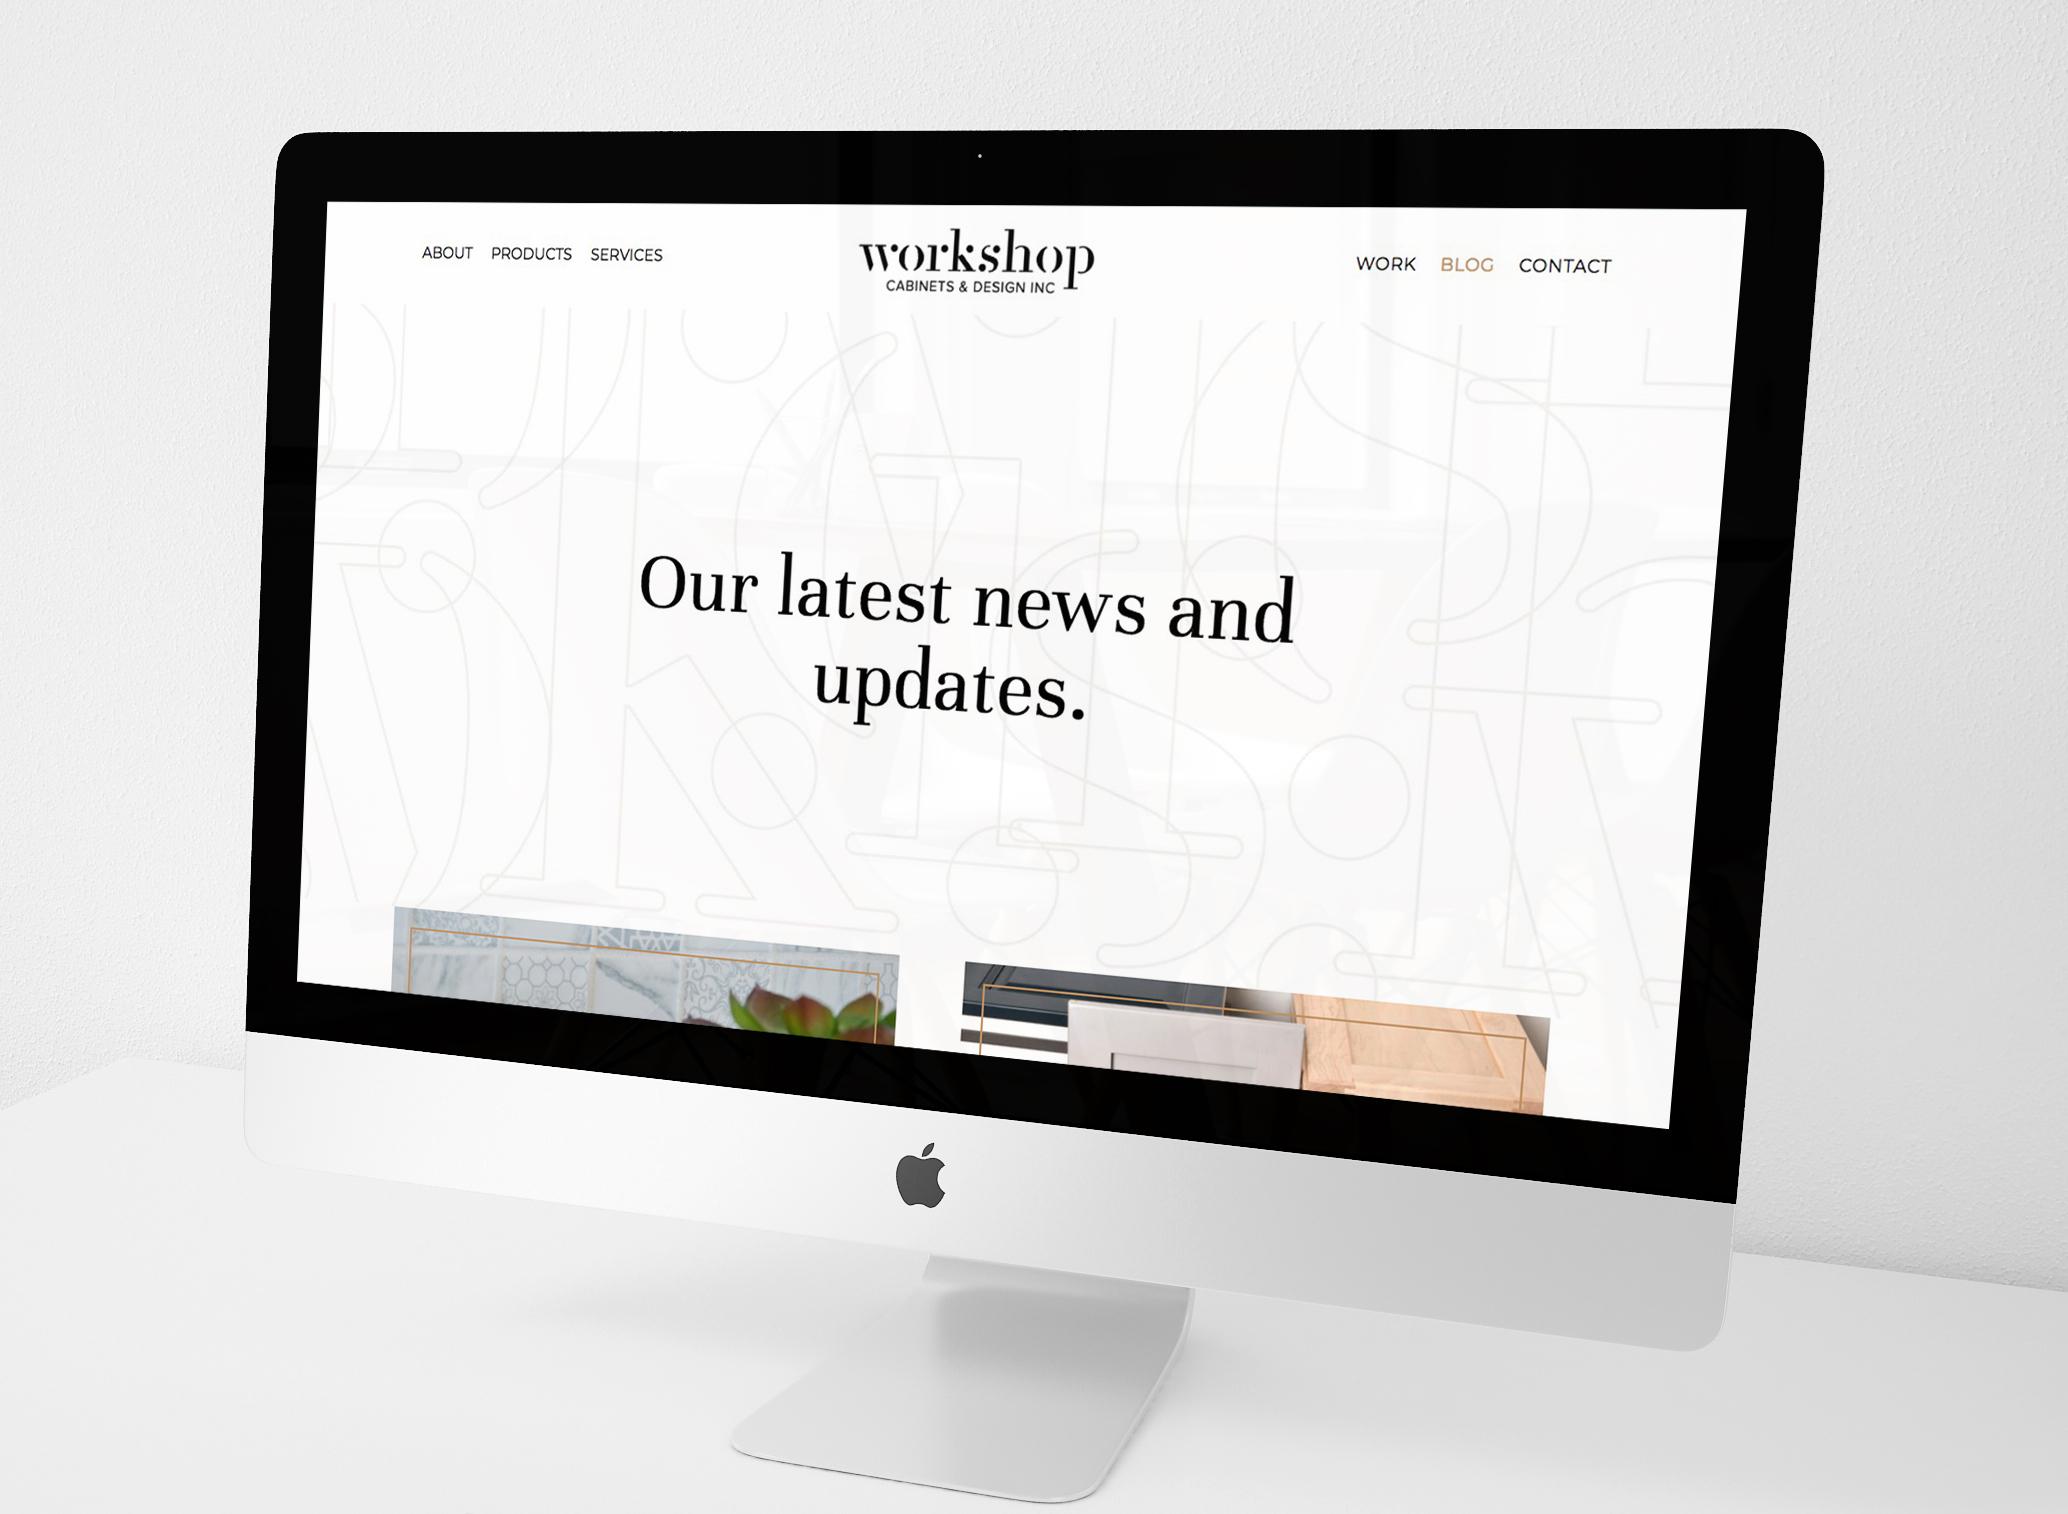 Natasia Designs Edmonton Website Designer and Developer Squarespace Branding Graphic Design Brand Workshop Cabinets and Design Camrose Alberta